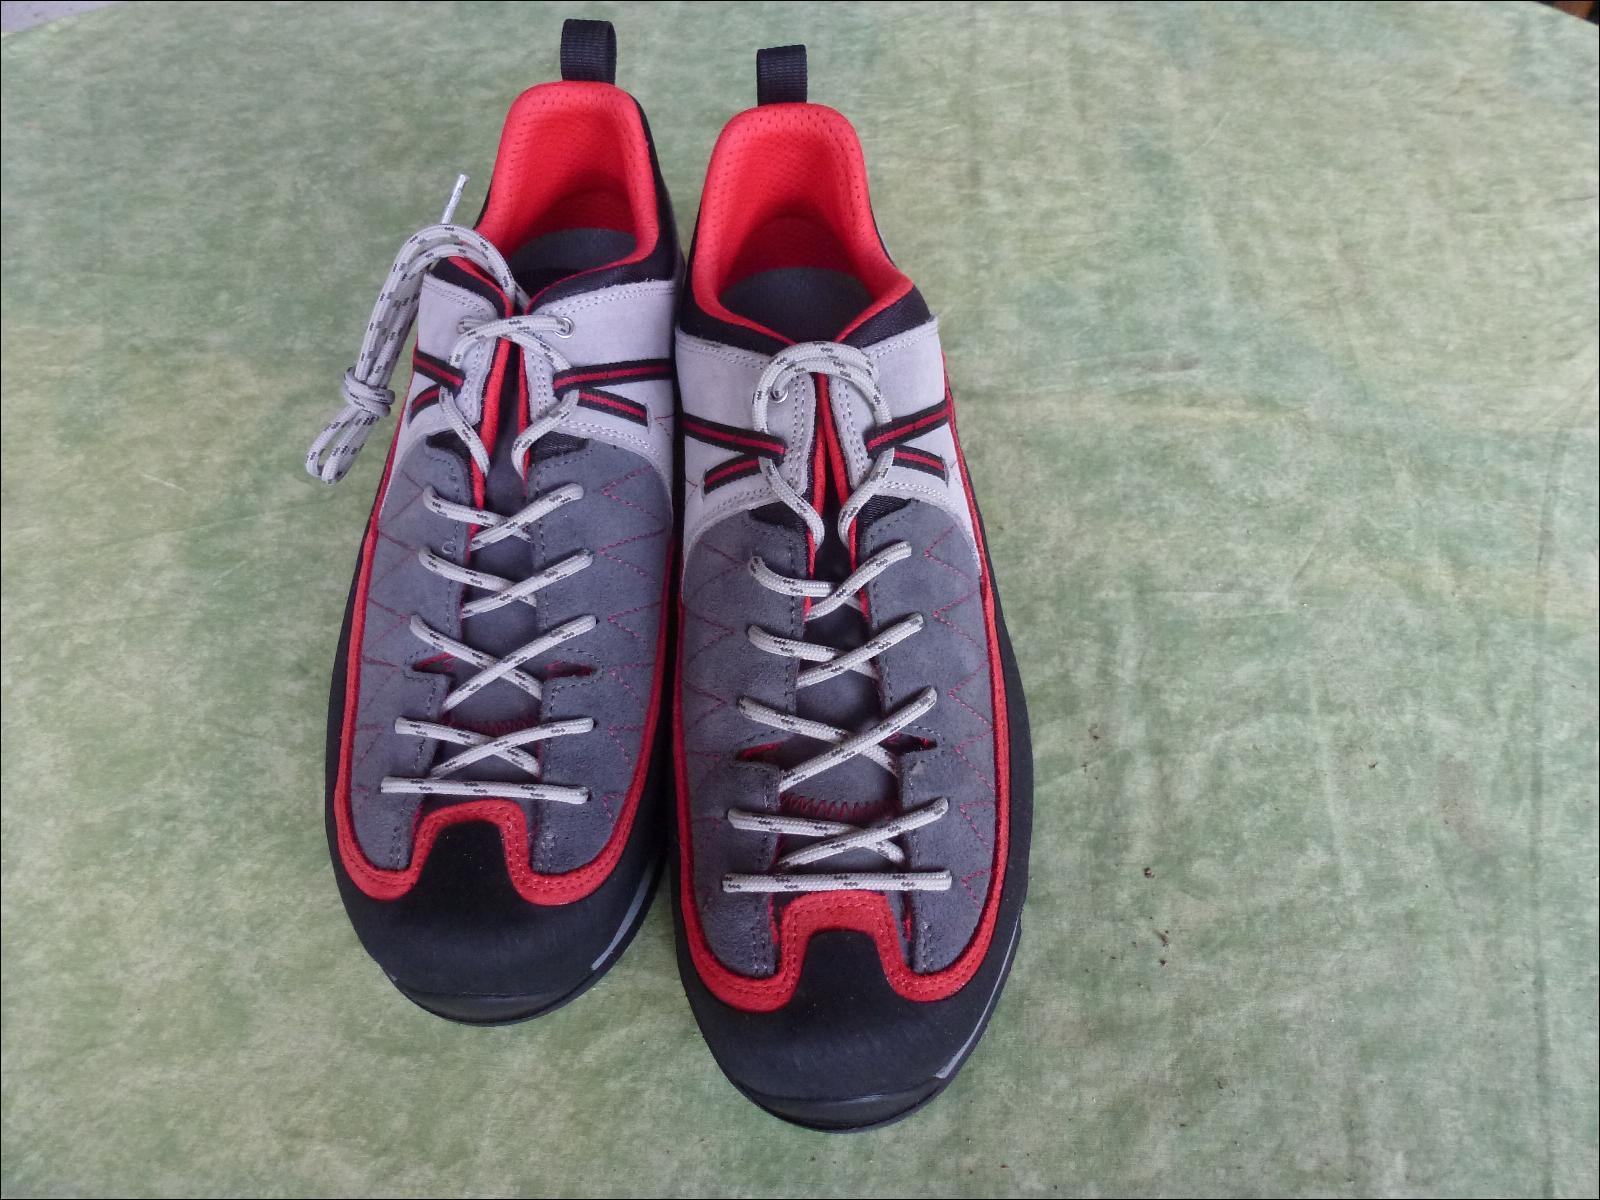 Chaussures Salyan D'approche Asolo Escalade Et pCFrp